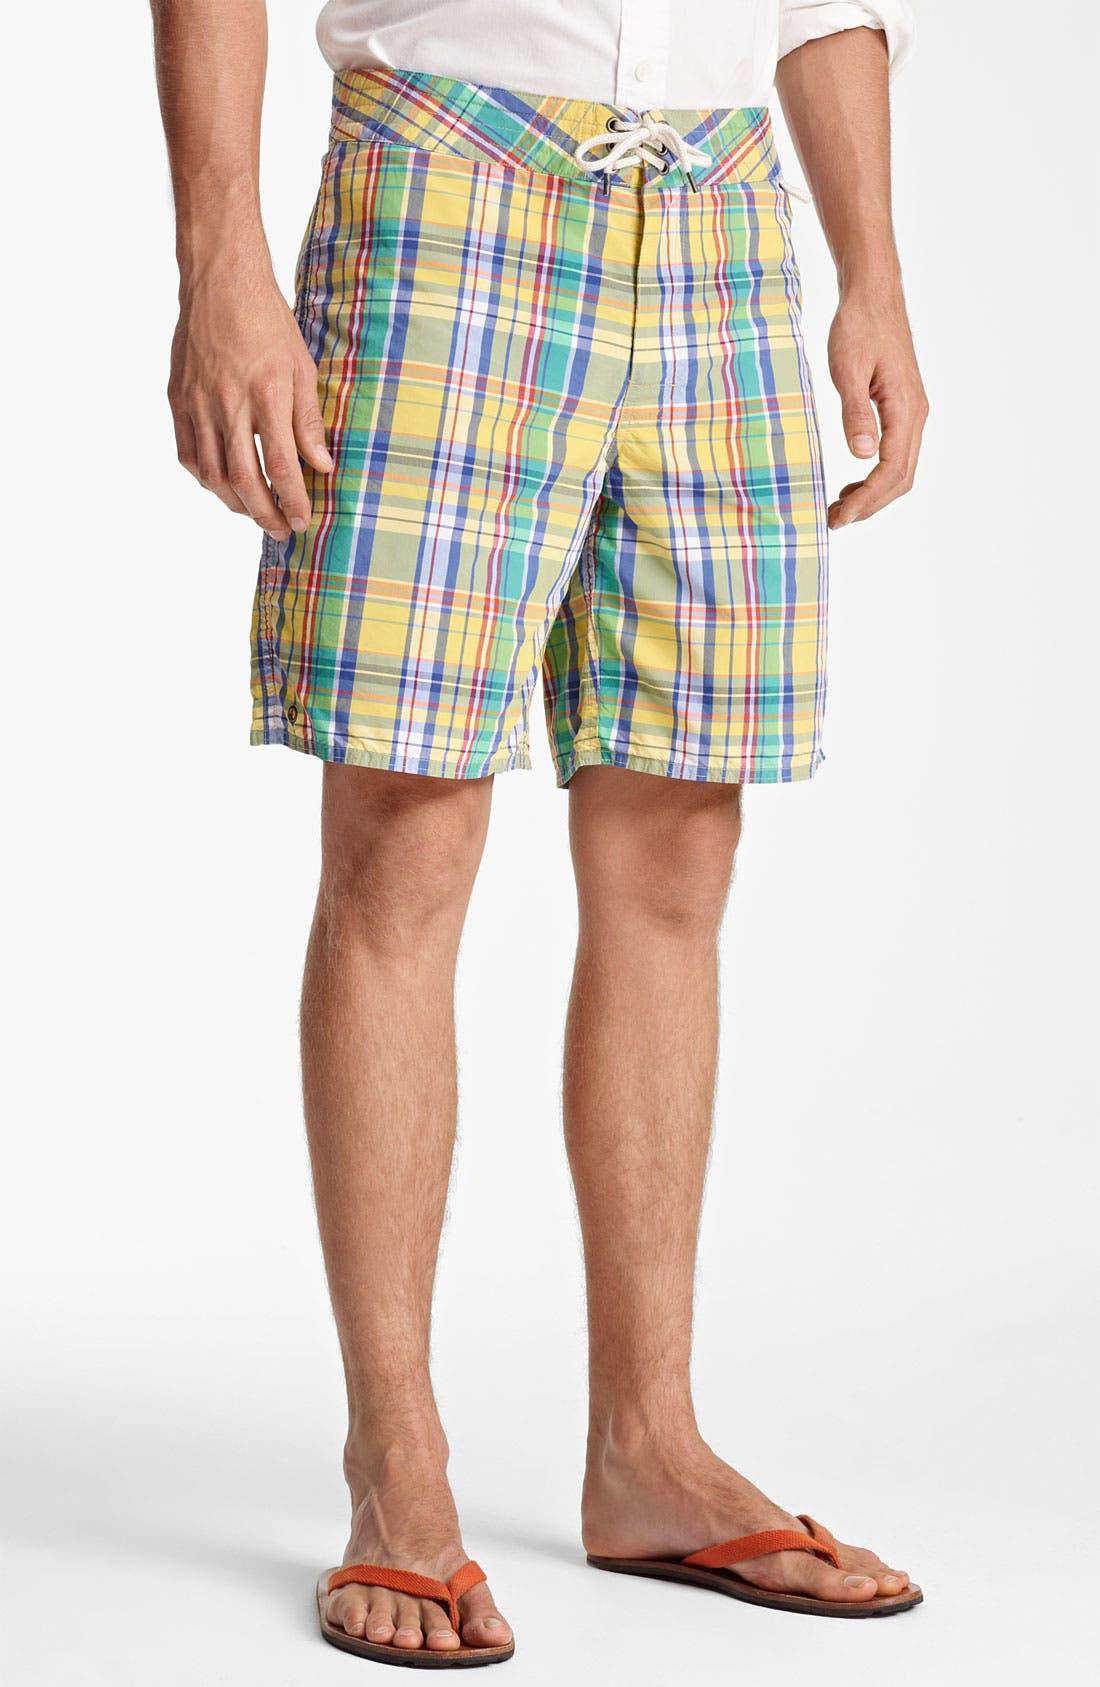 Alternate Image 1 Selected - Polo Ralph Lauren 'Palm Island' Board Shorts